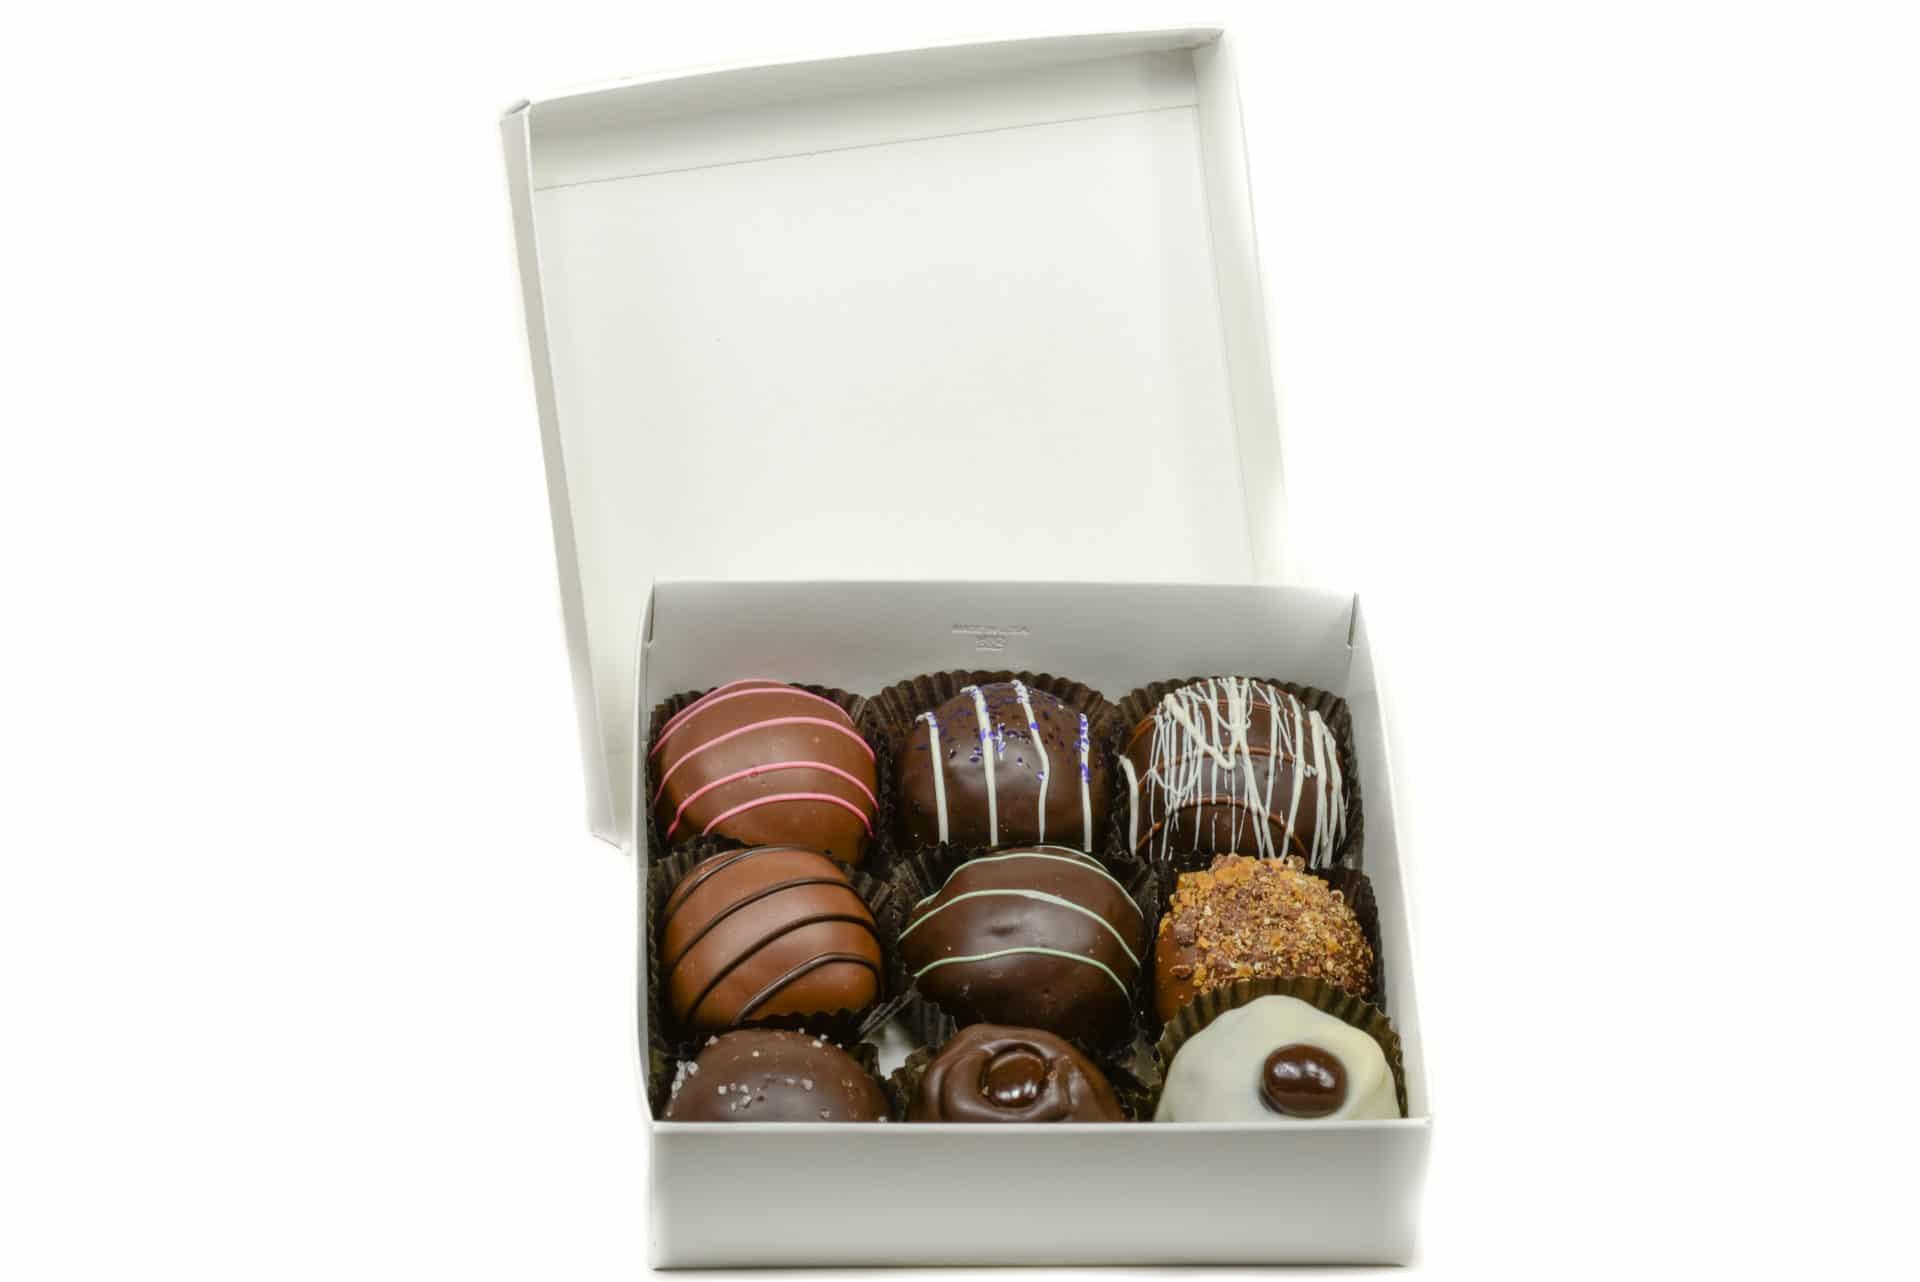 truffle box 9 piece alaskan fudge company